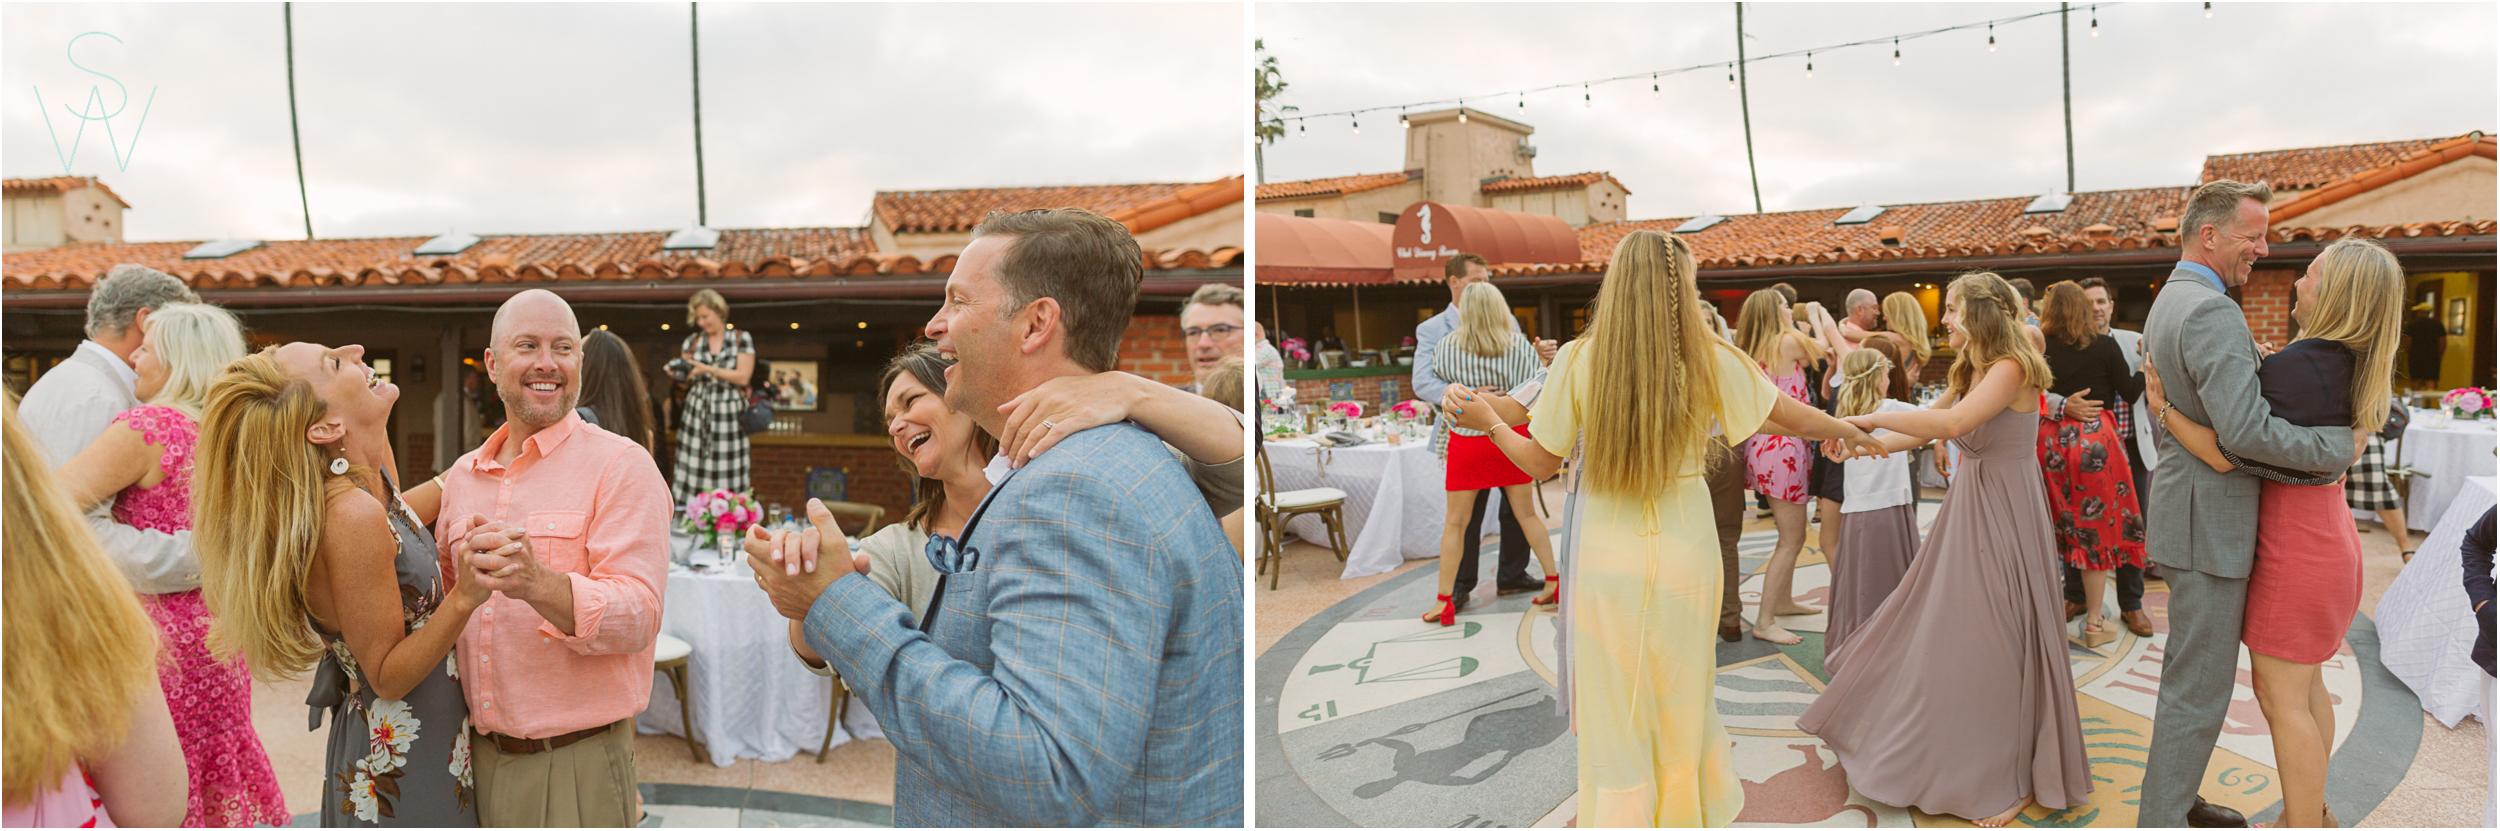 shewanders.wedding.photography.la.jolla-1060.jpg